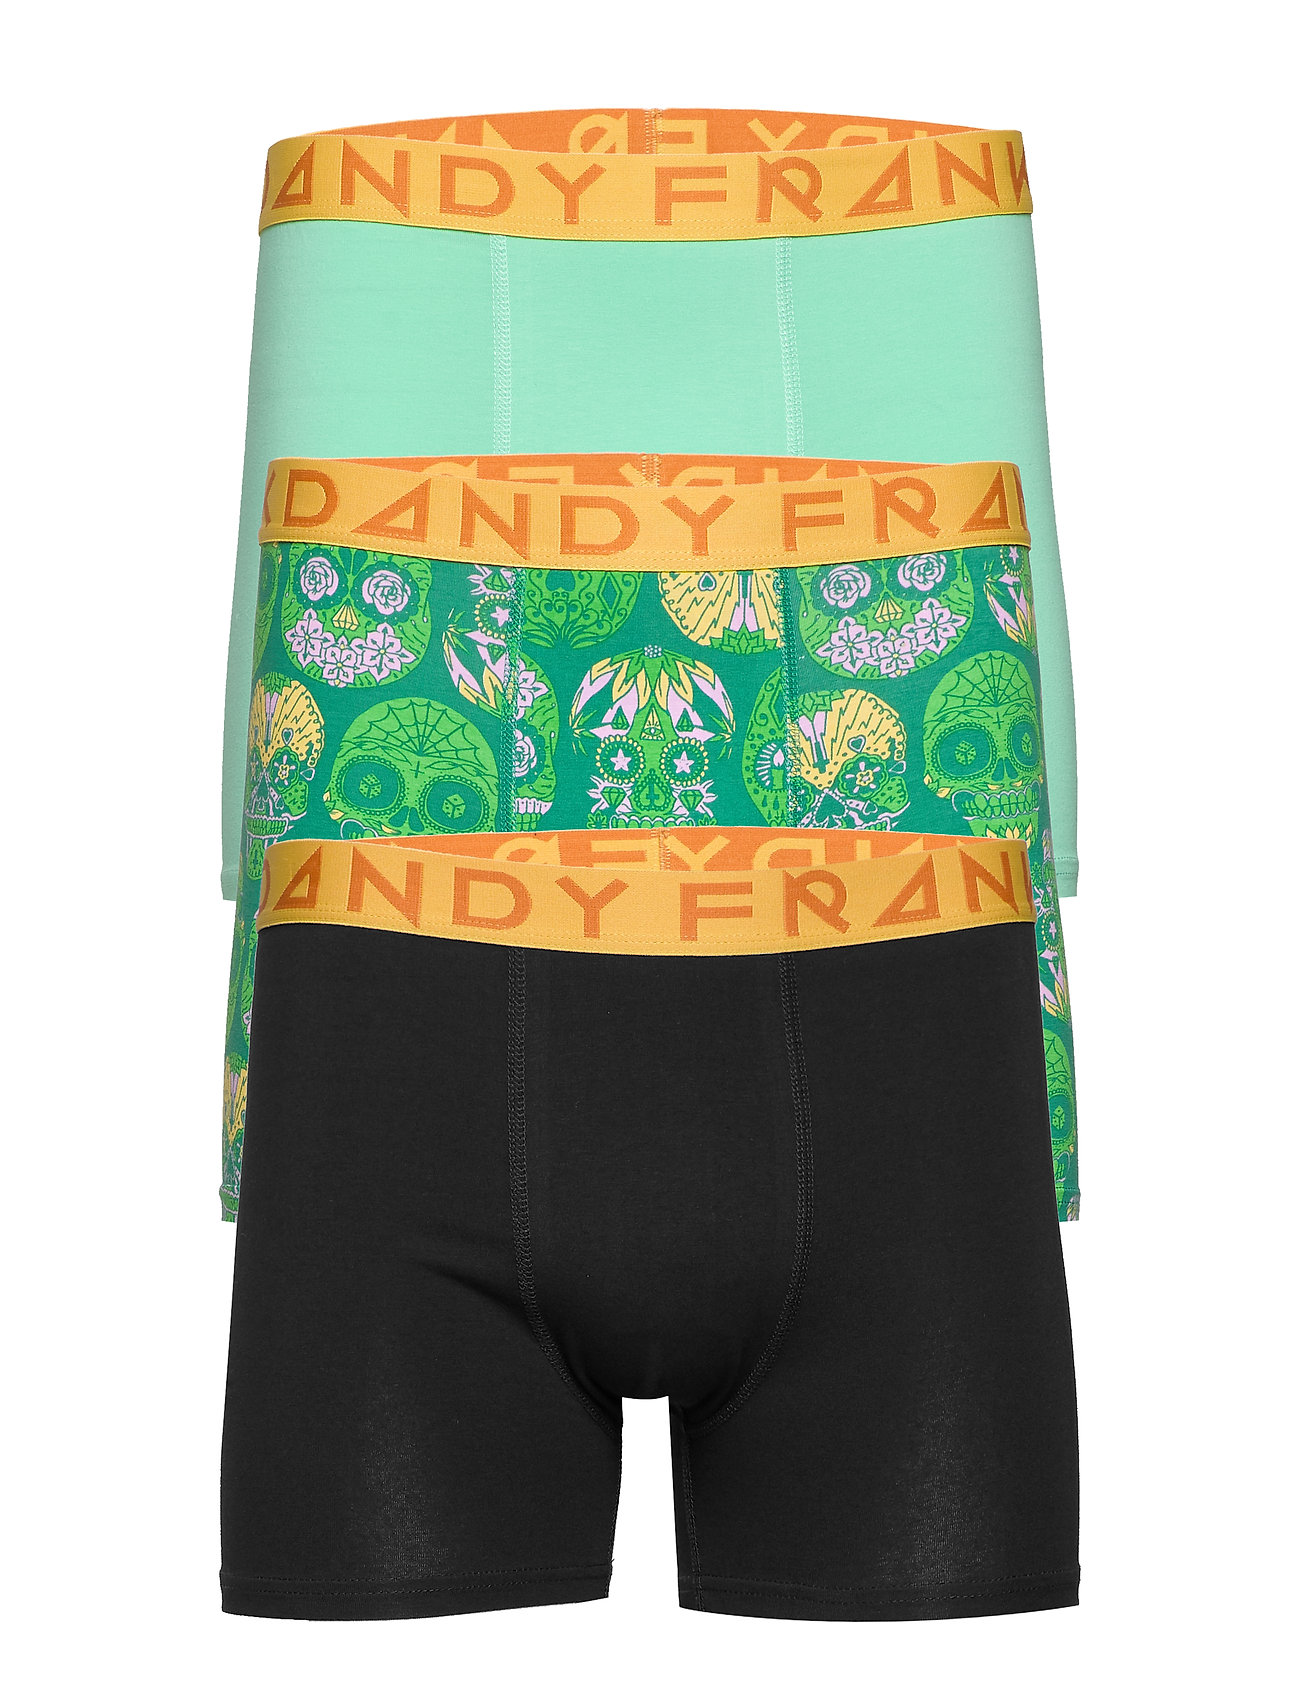 Frank Dandy 3 Pack Calaveras Boxer - DK GREEN/GREEN/BLACK